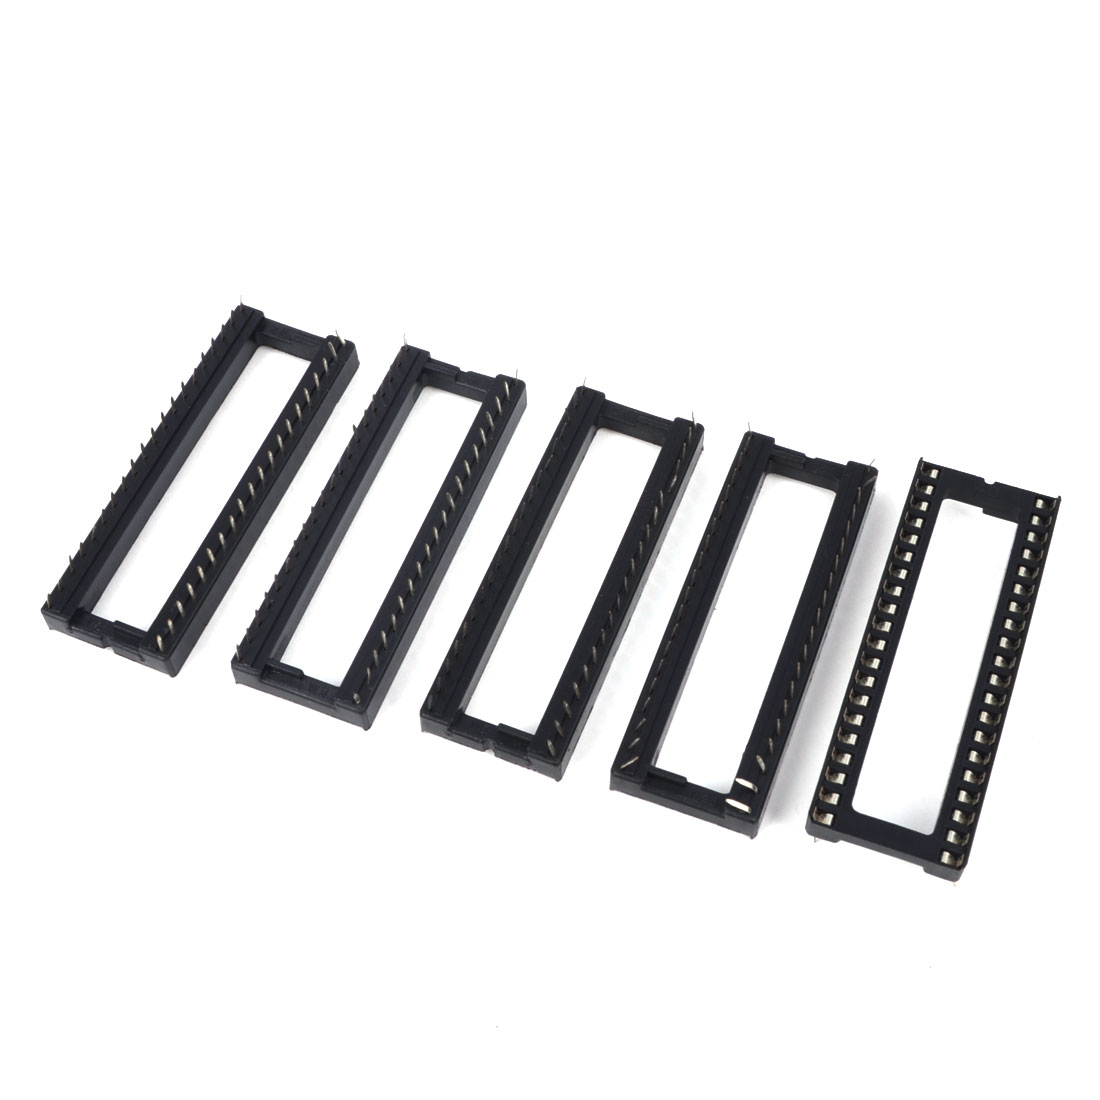 2.54mm Pitch Through Hole 40 Pins DIP IC Socket PCB Board Adapter 5 Pcs